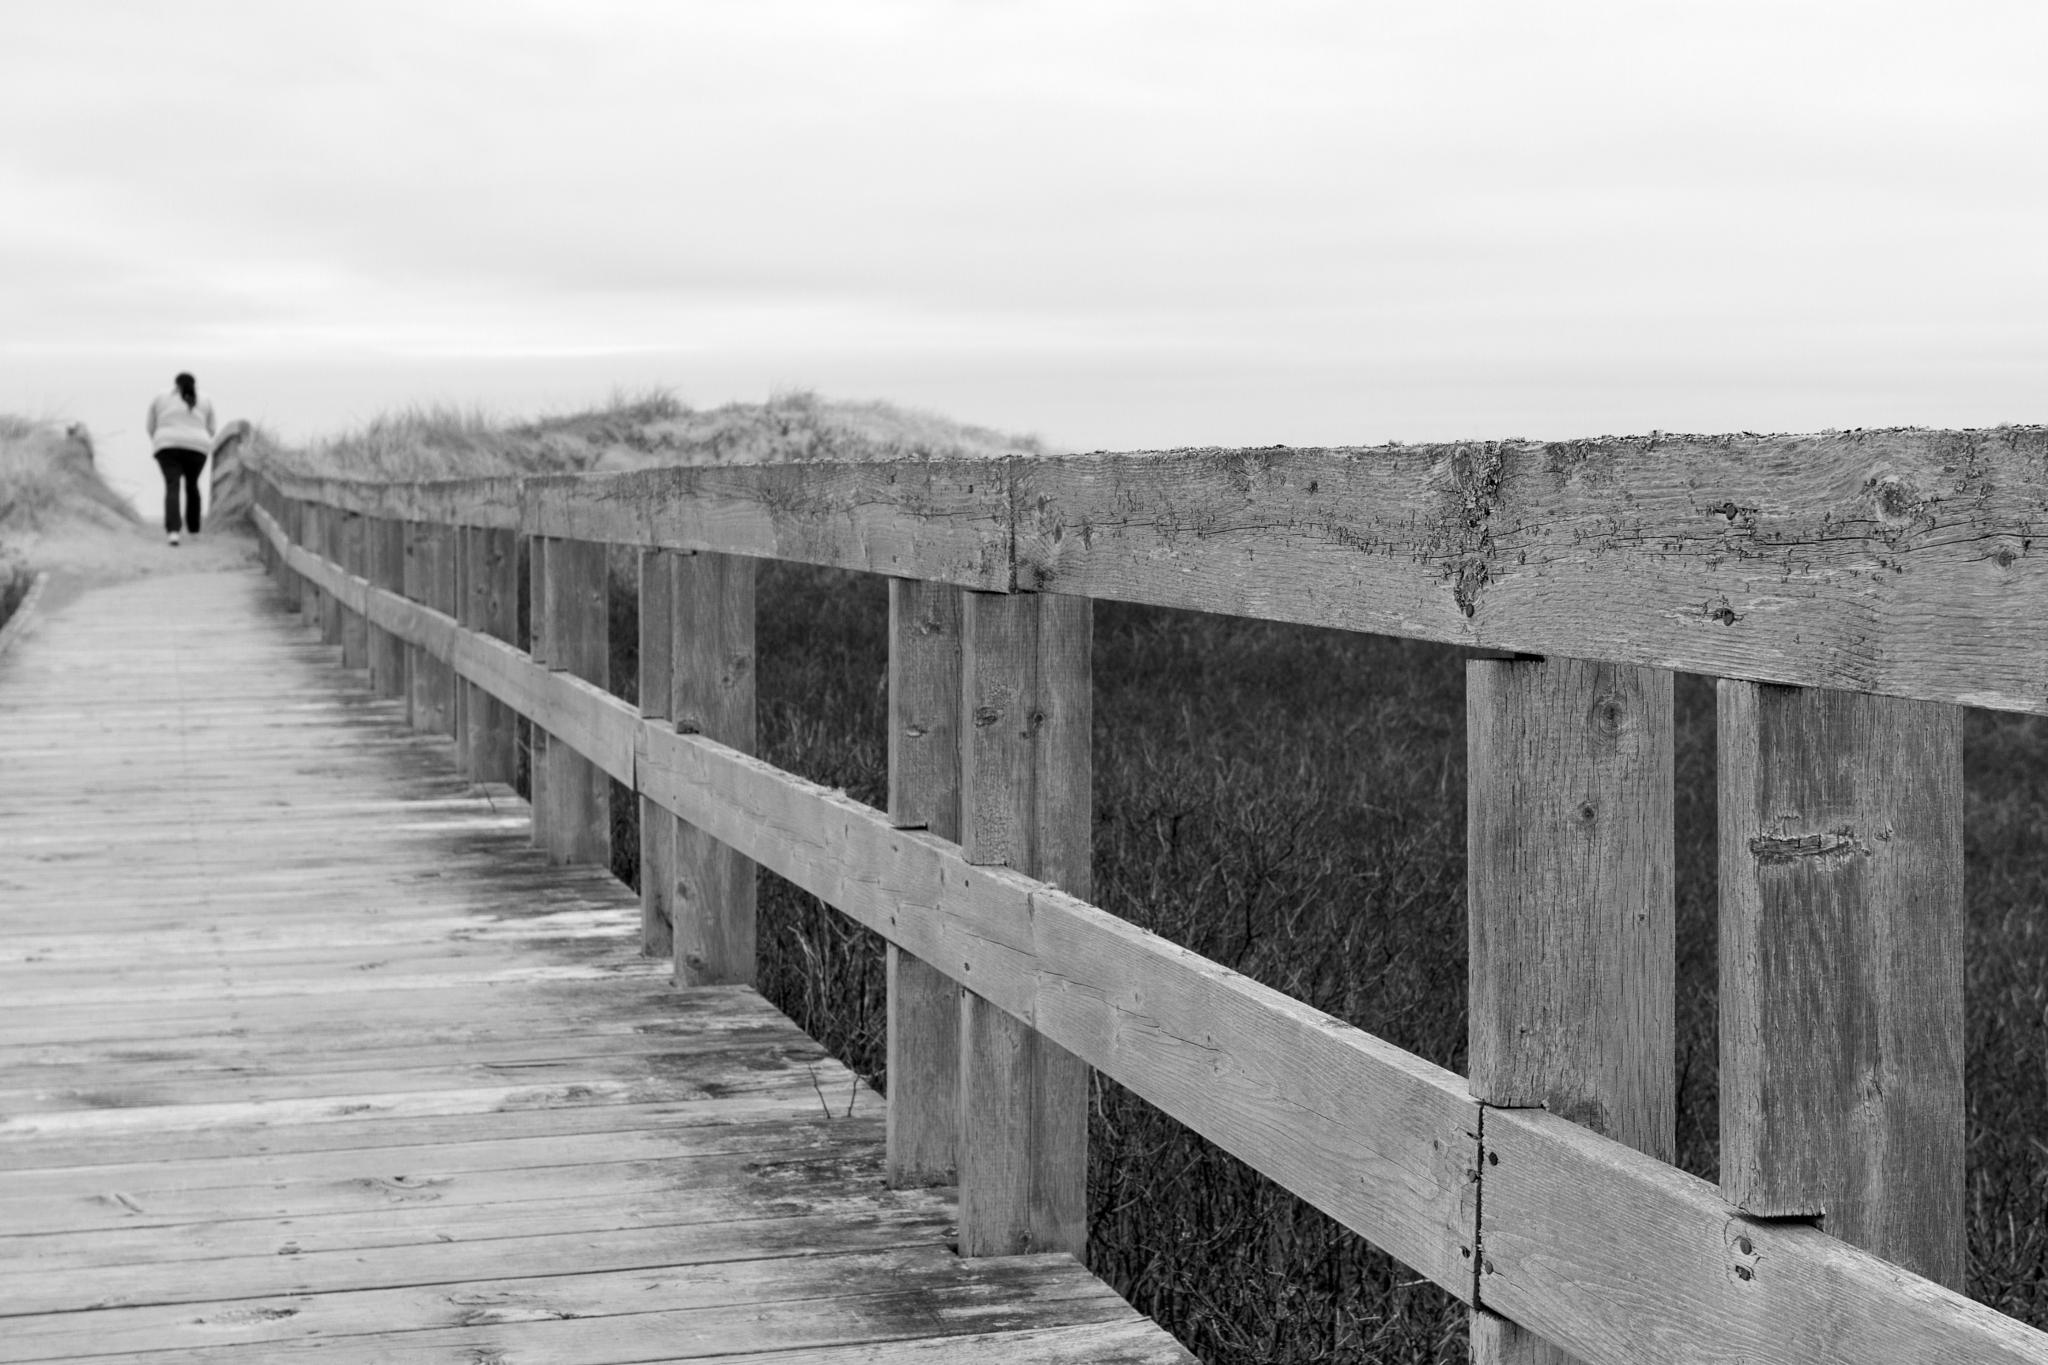 Walk to the Beach by Joe Chrvala